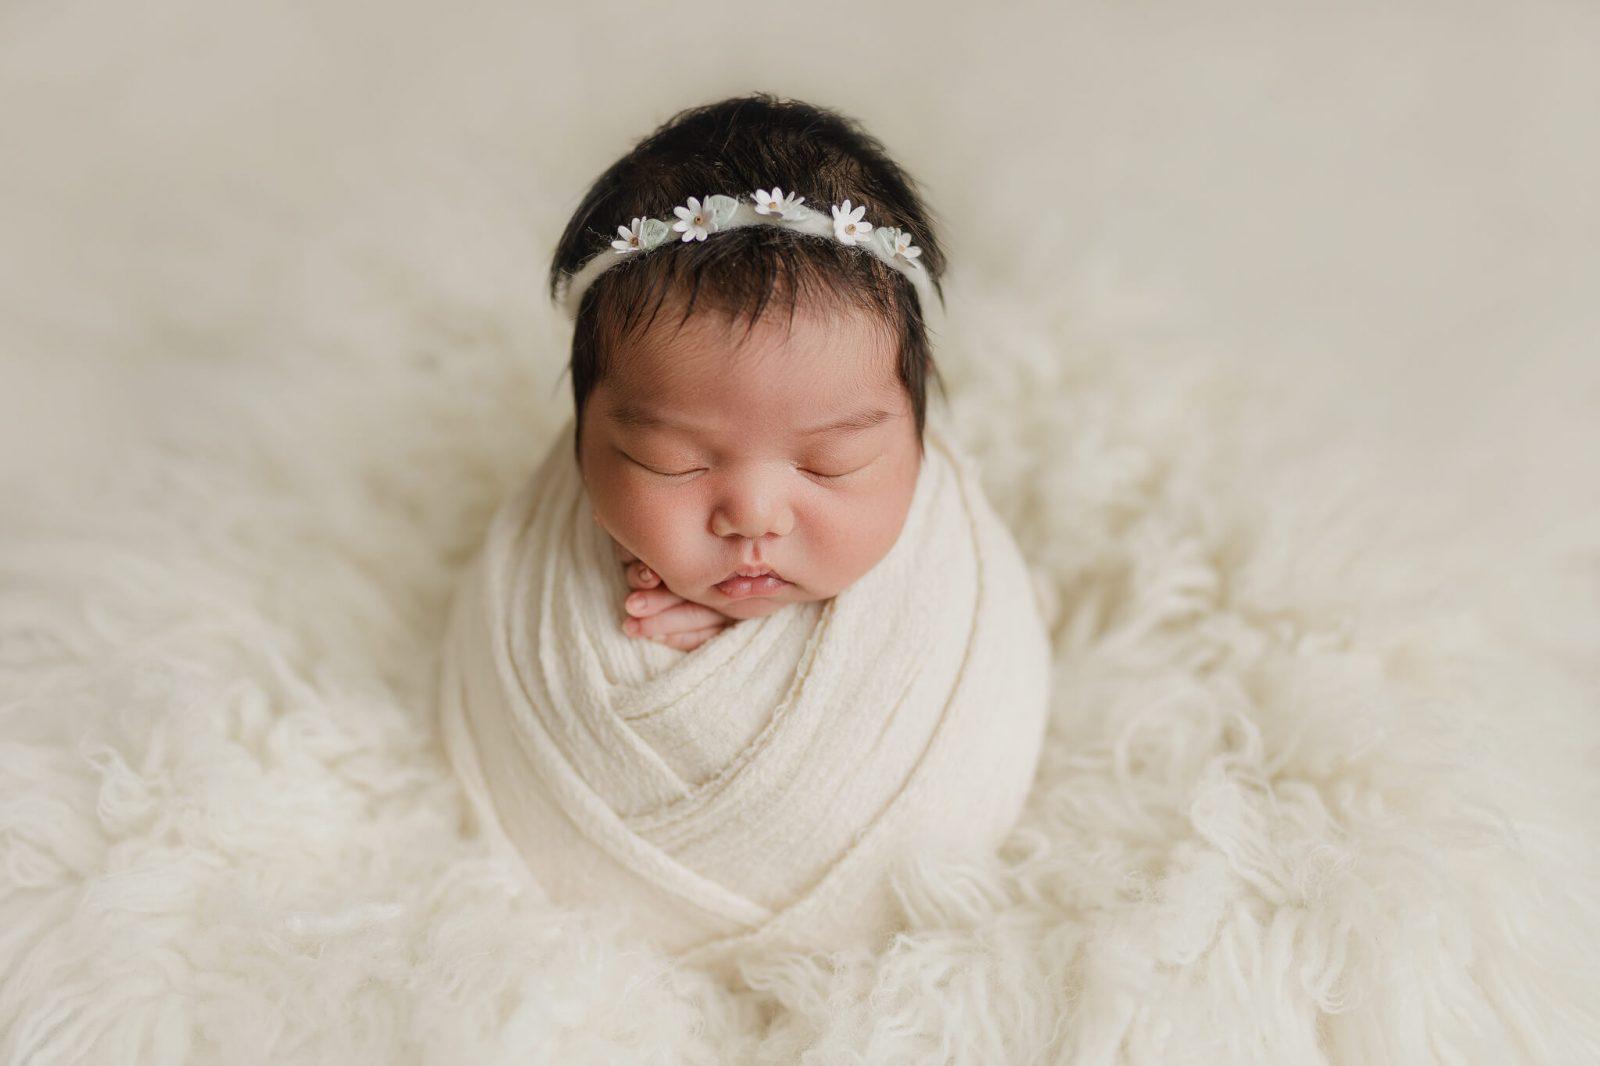 newborn photoshoot in Harold hill